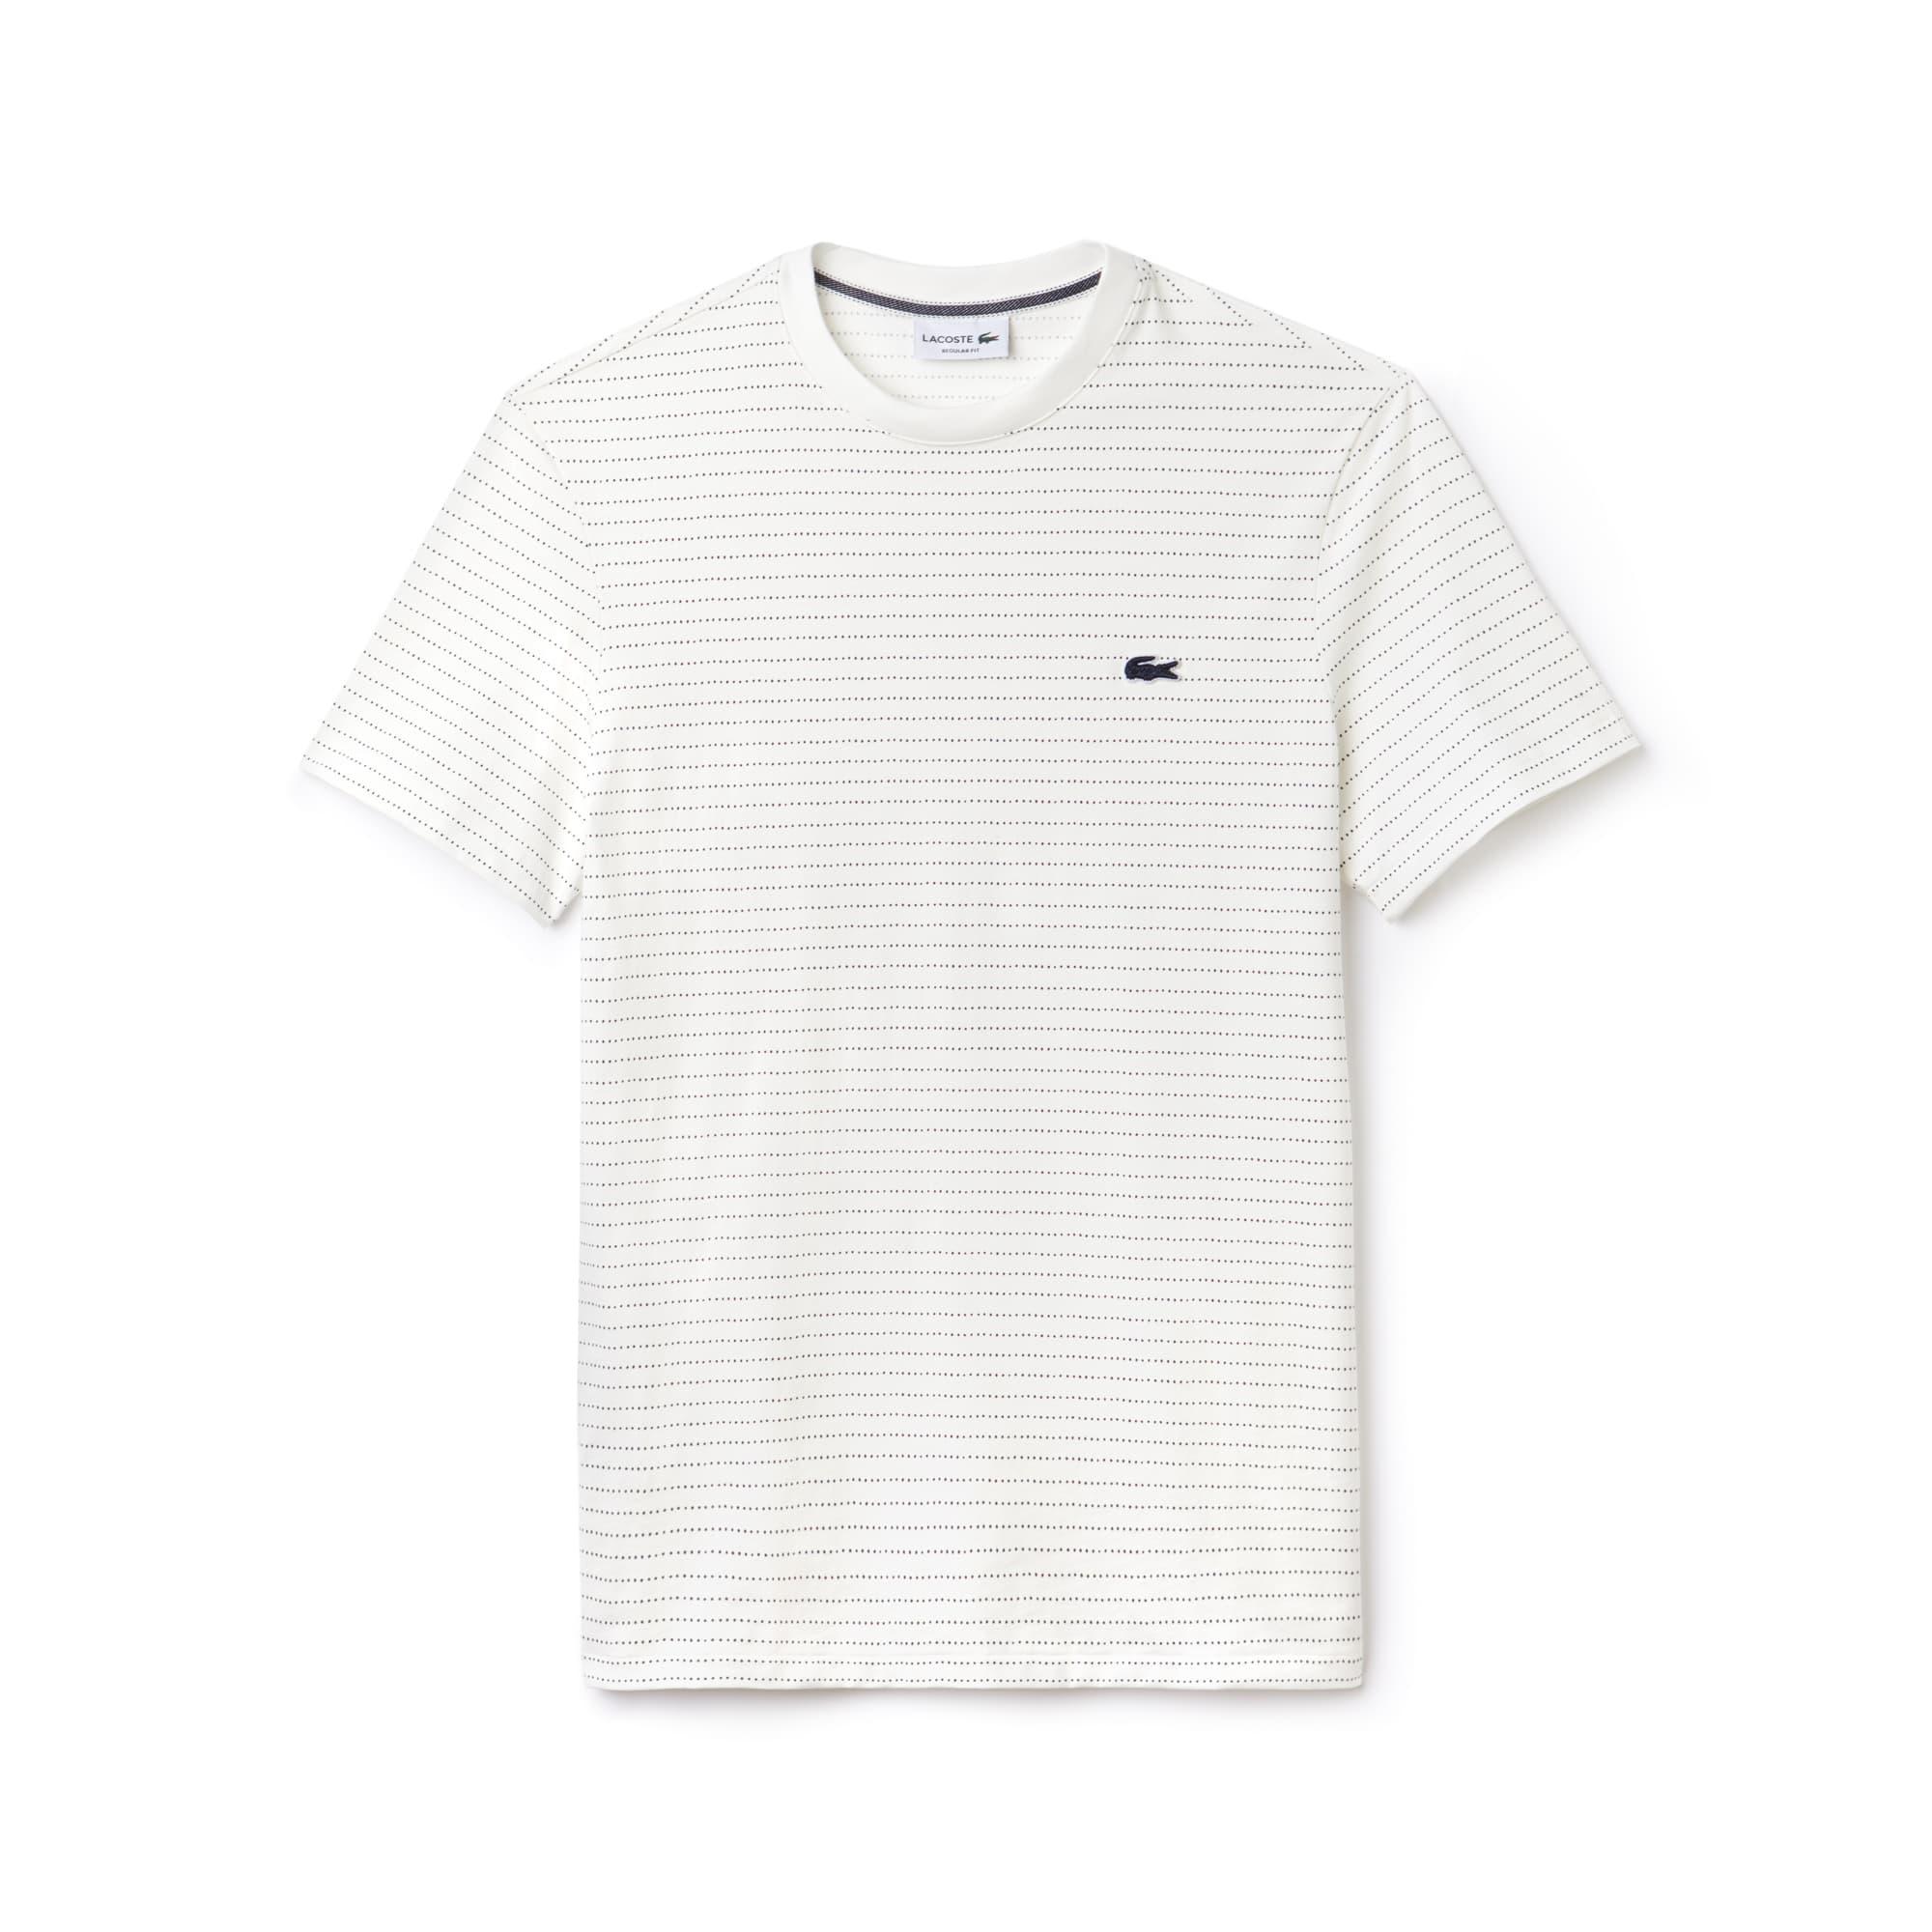 Men's Crew Neck Net Print Cotton Jersey T-shirt